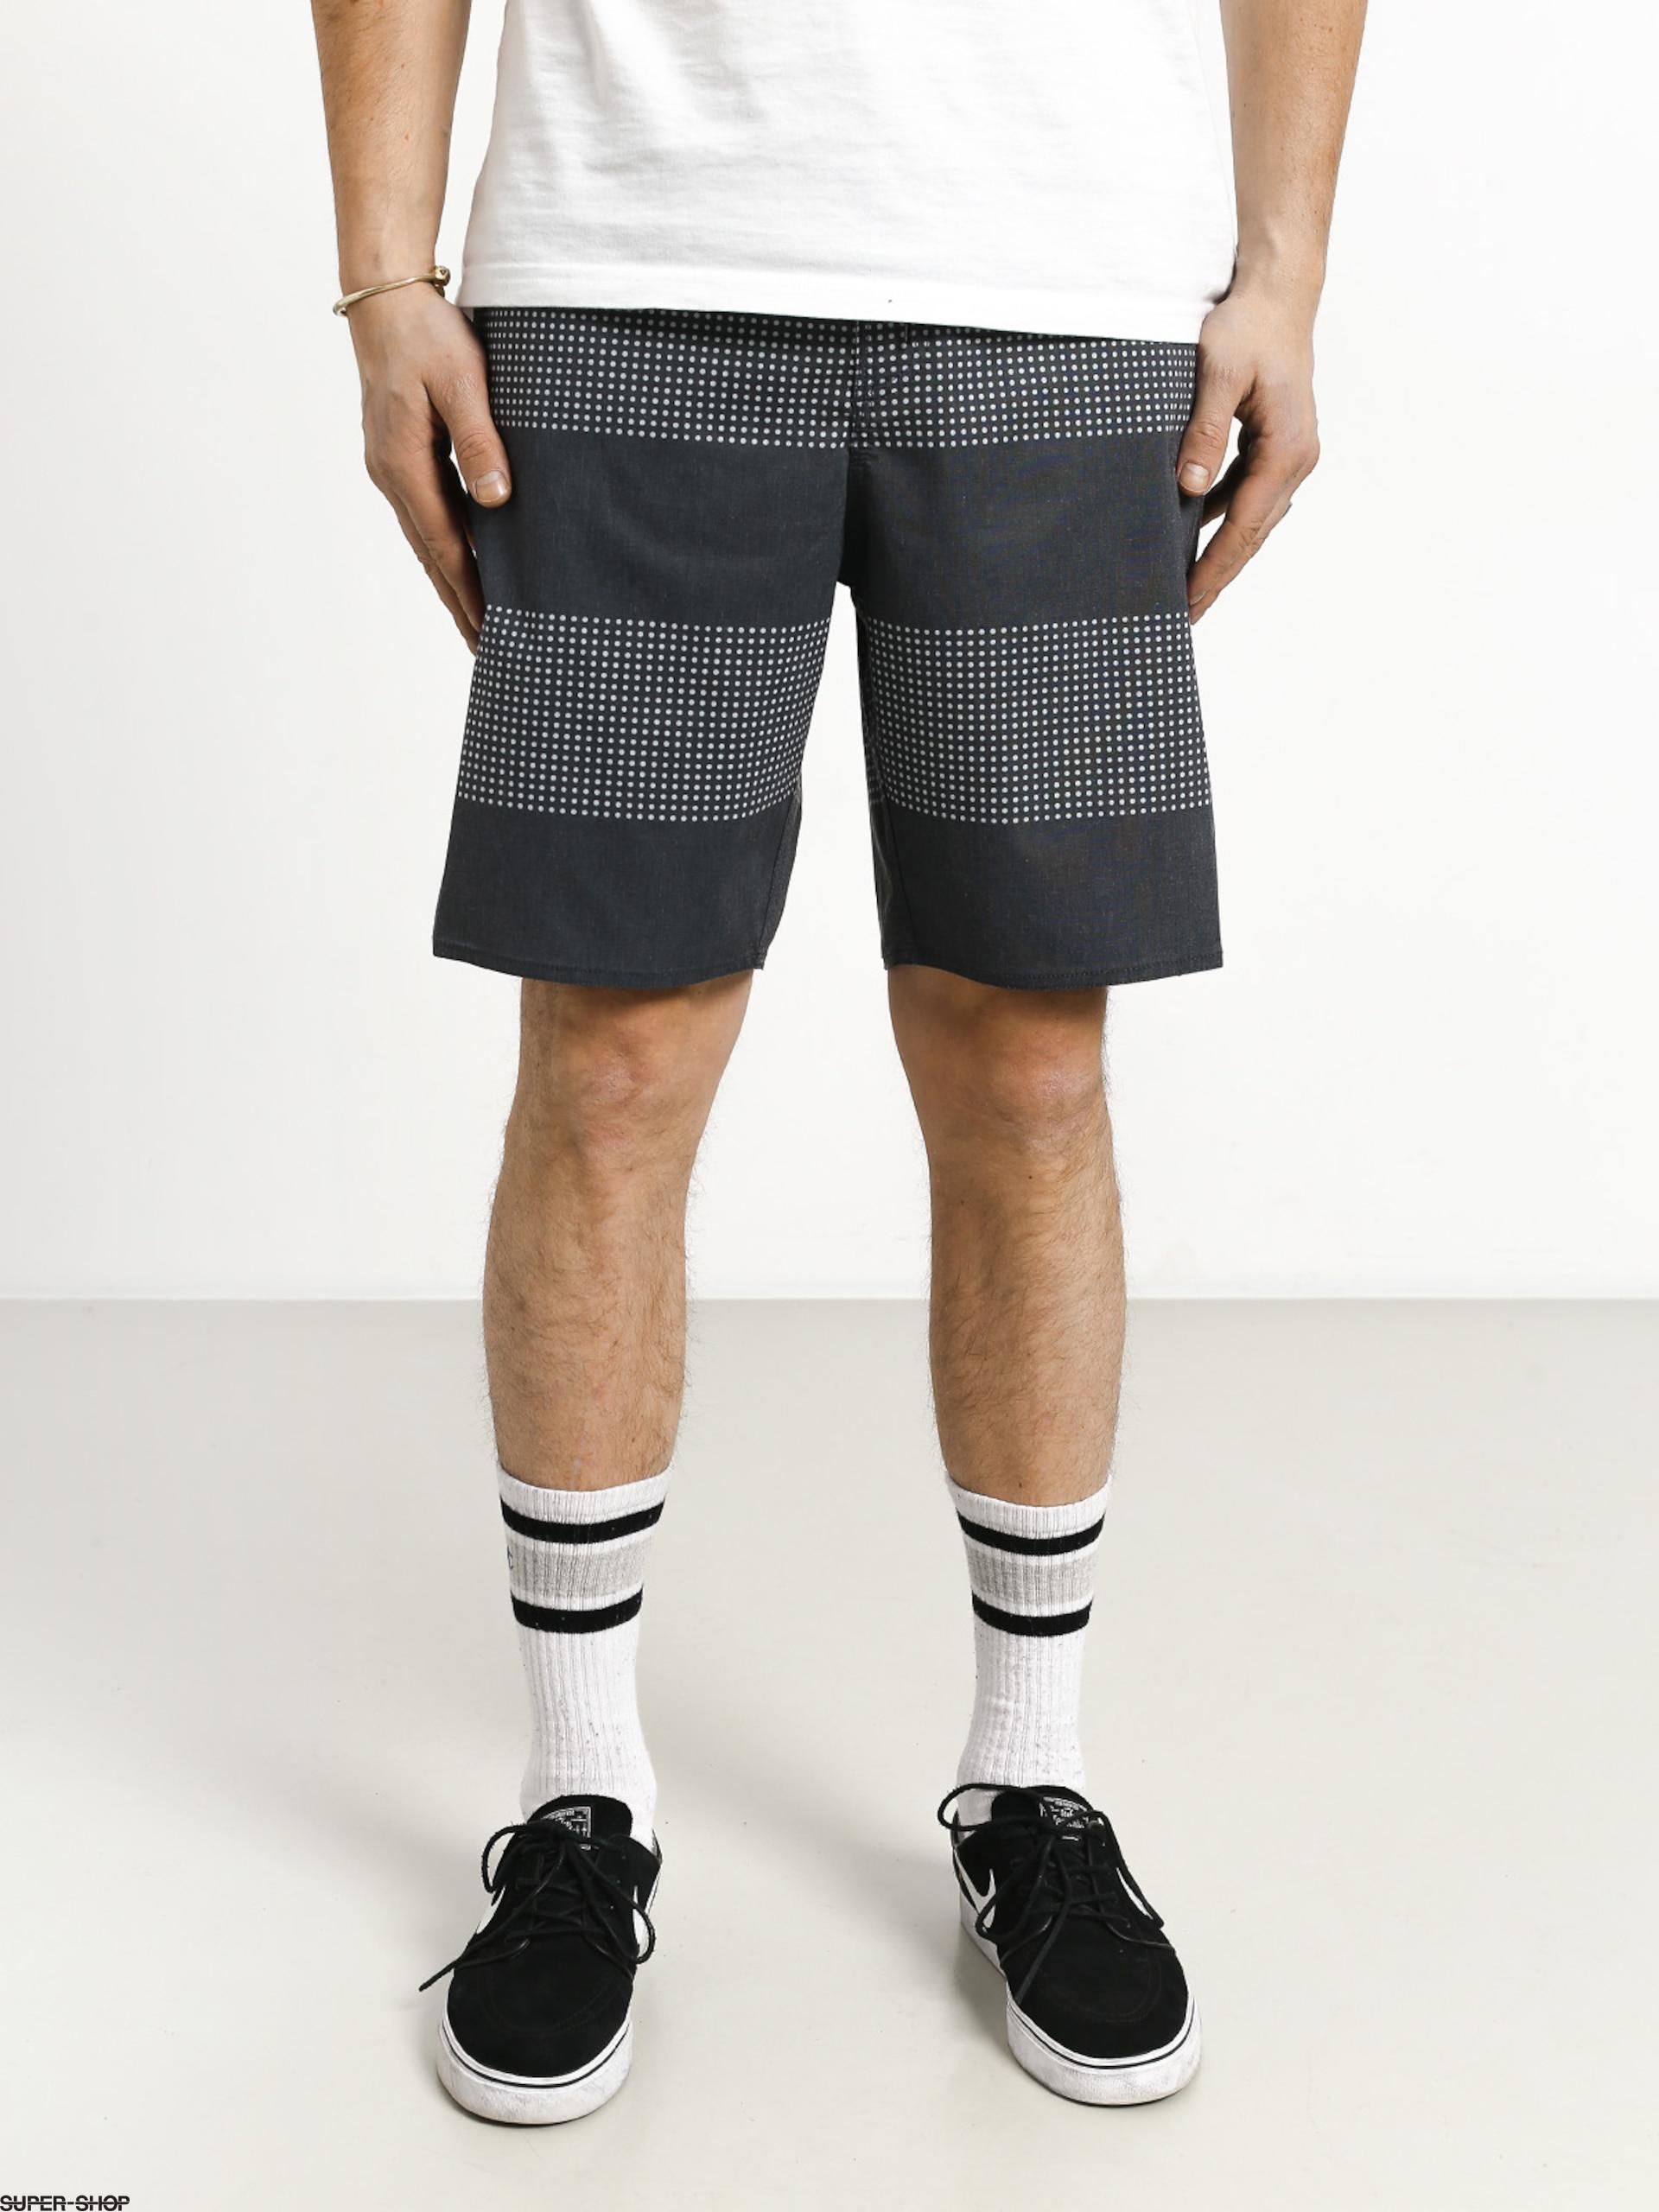 b7e04dfcfaab0 1022769-w1920-brixton-barge-stripe-trunk-shorts-navy-off-white.jpg